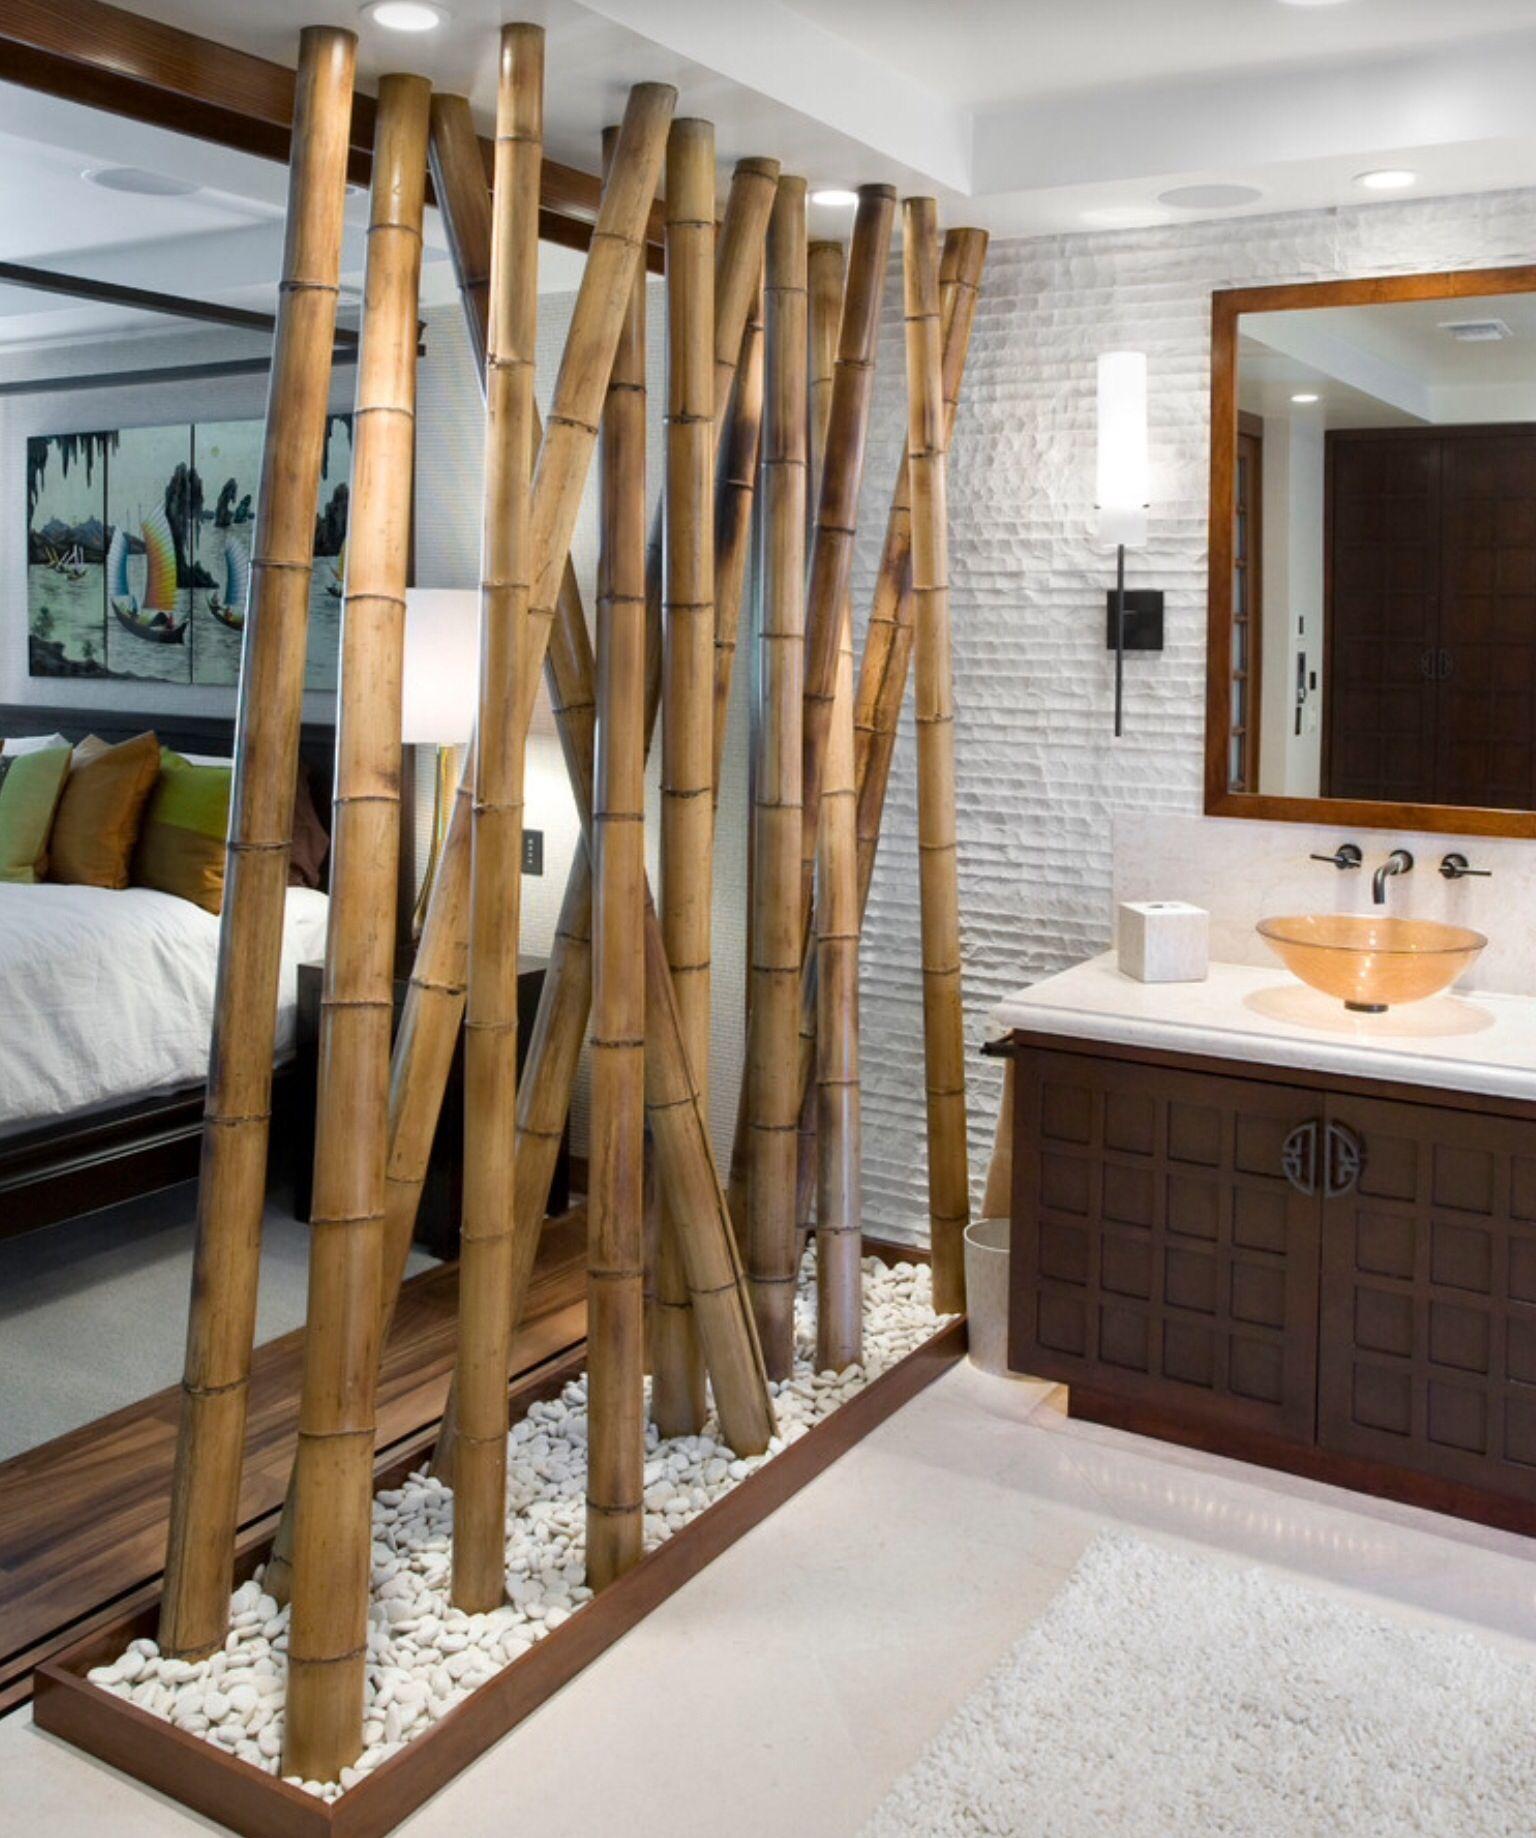 Bedroom bathroom home decoration eco building pinterest